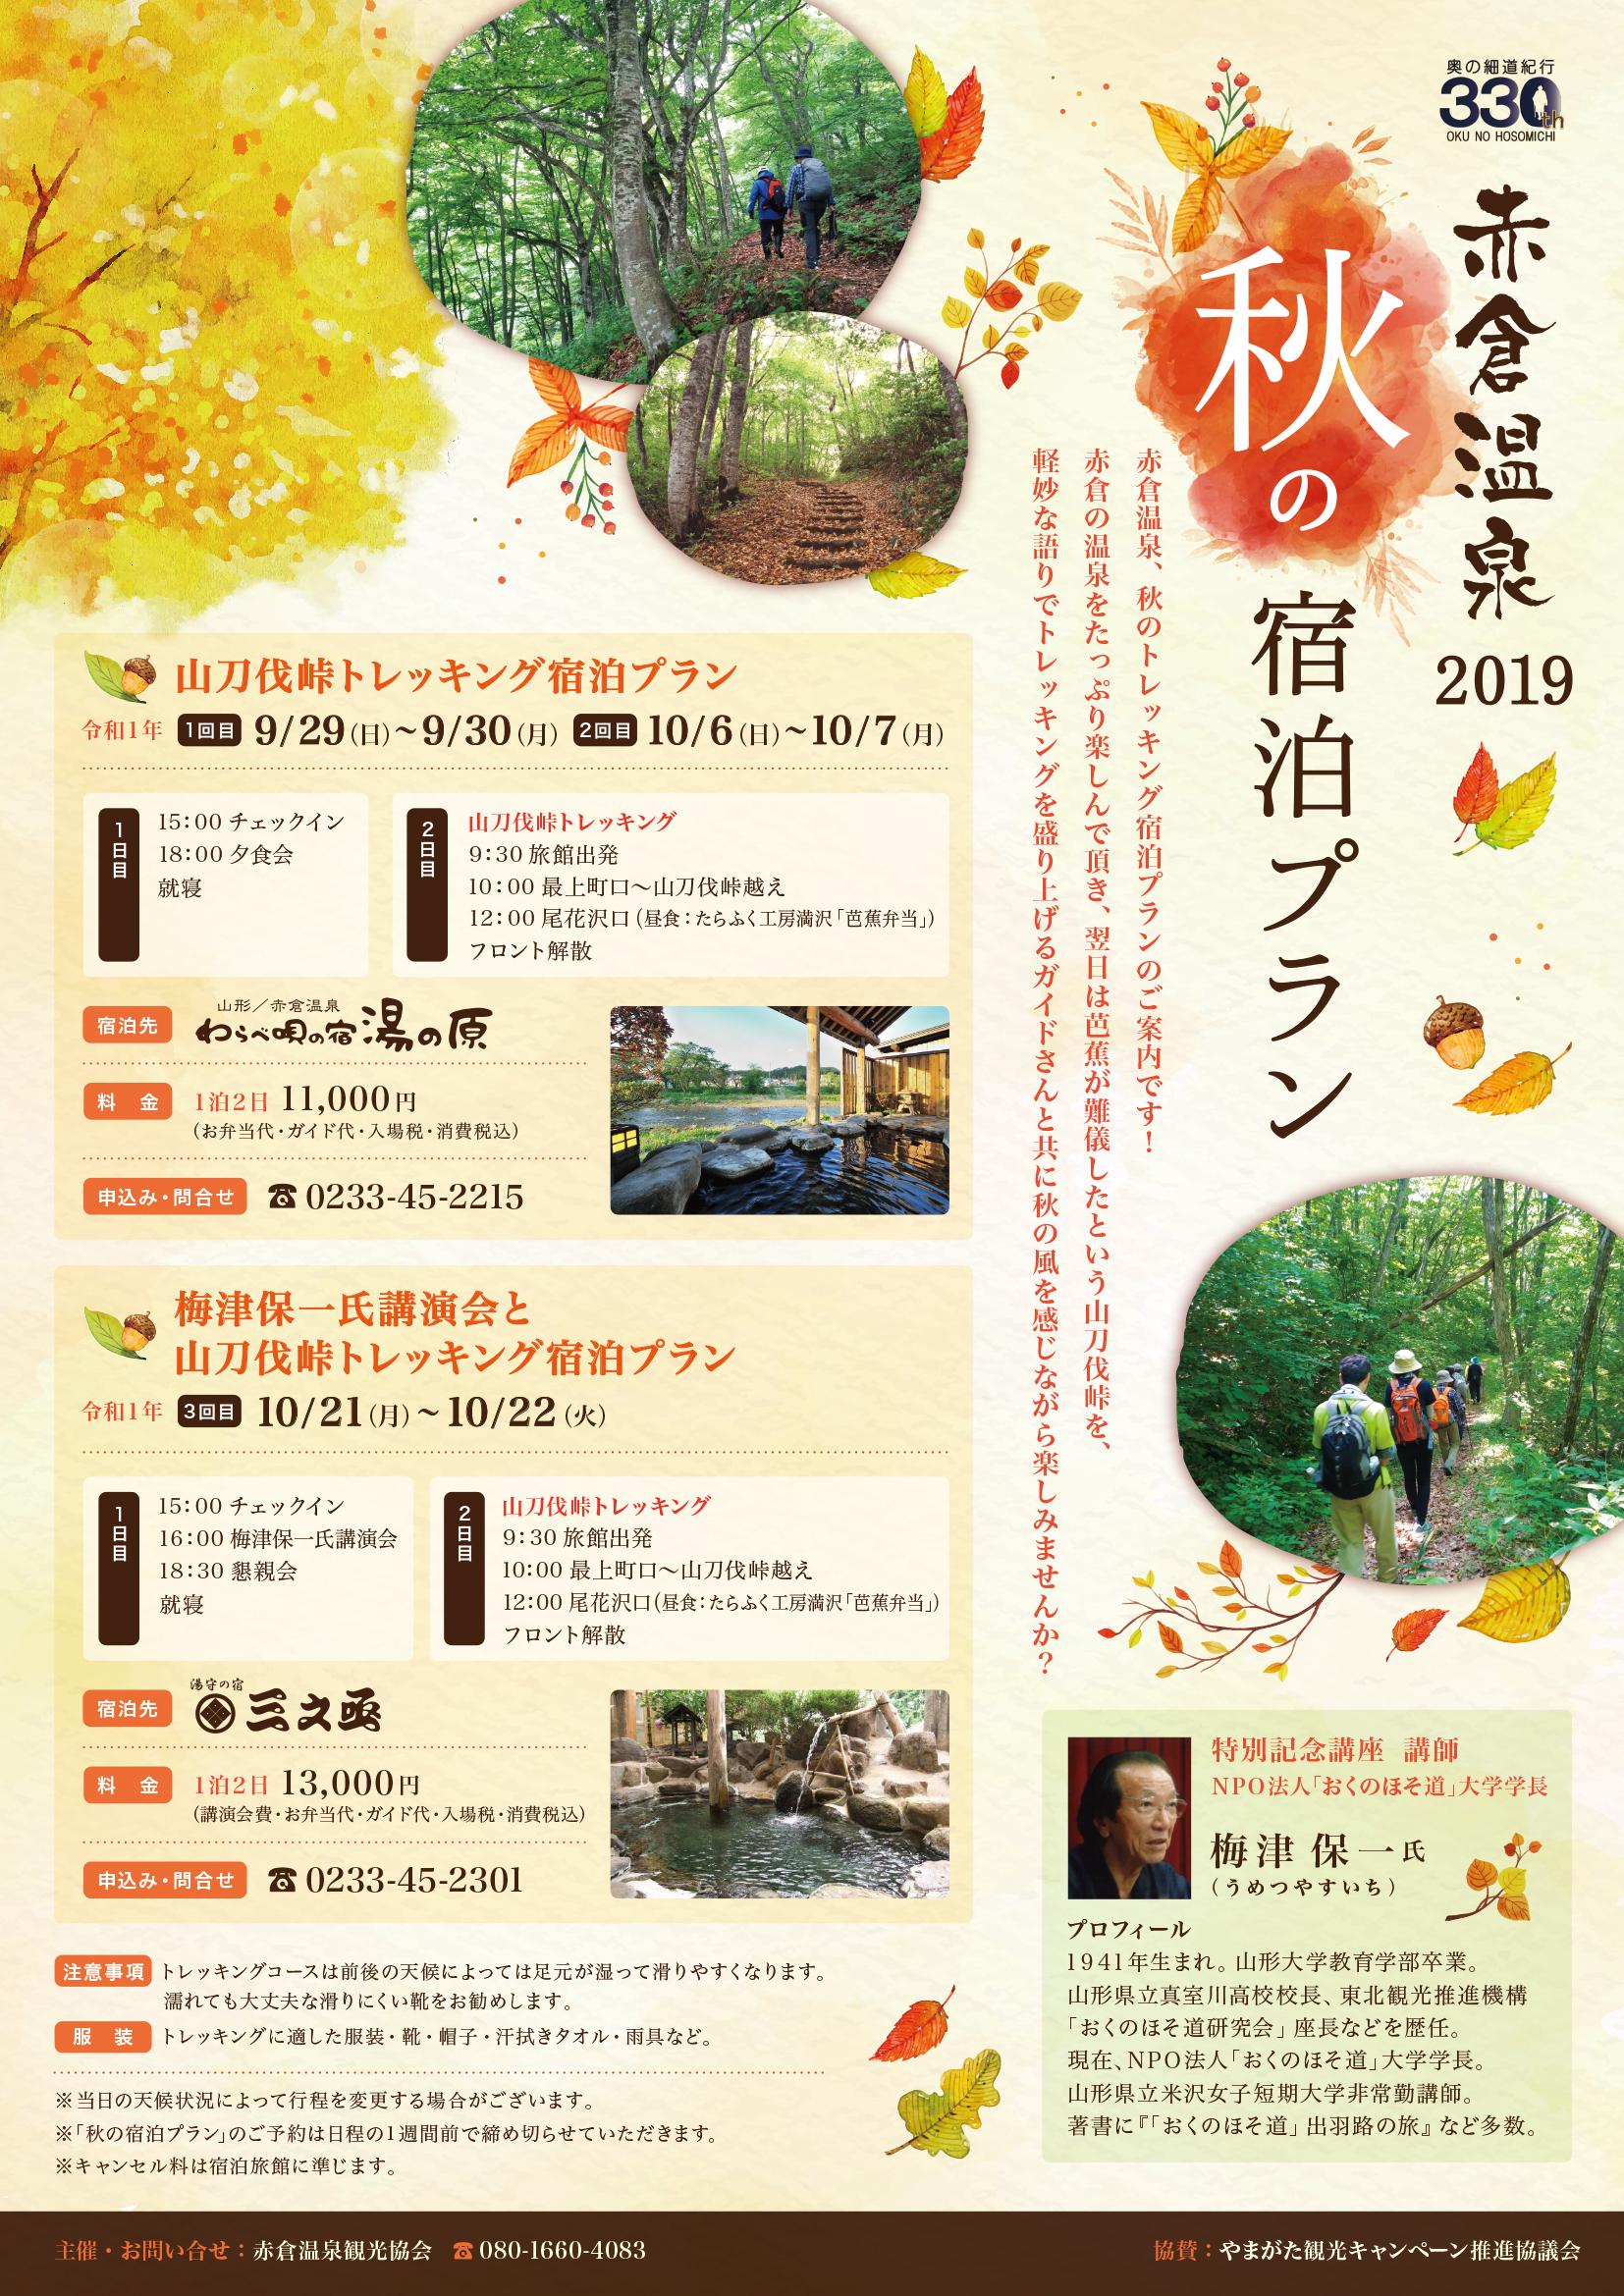 http://akakura-spa.com/oshirase/blog/akakura_flyer.jpg